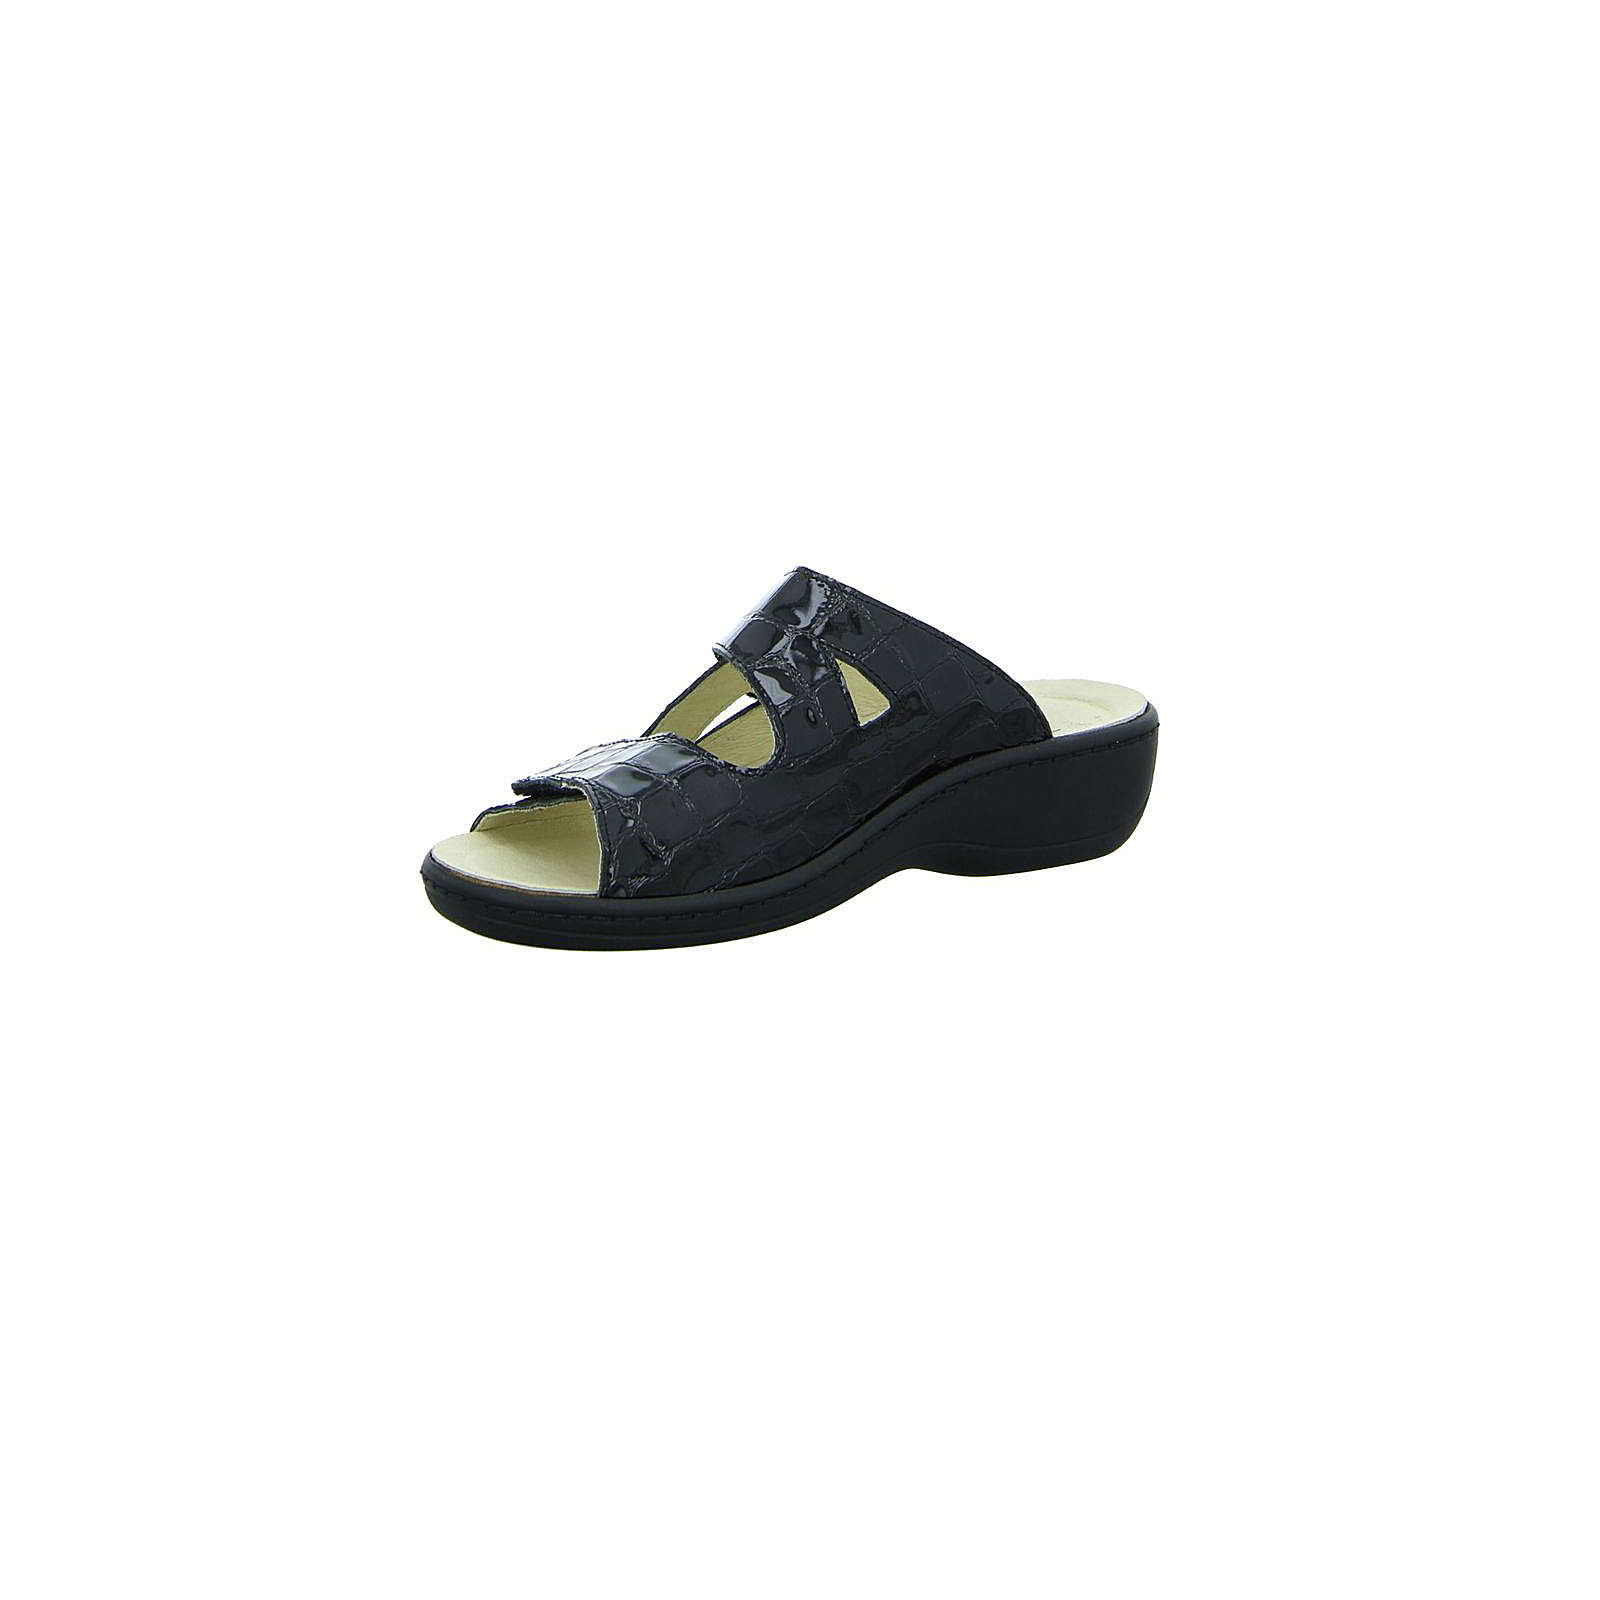 Longo Komfort-Pantoletten schwarz Damen Gr. 40